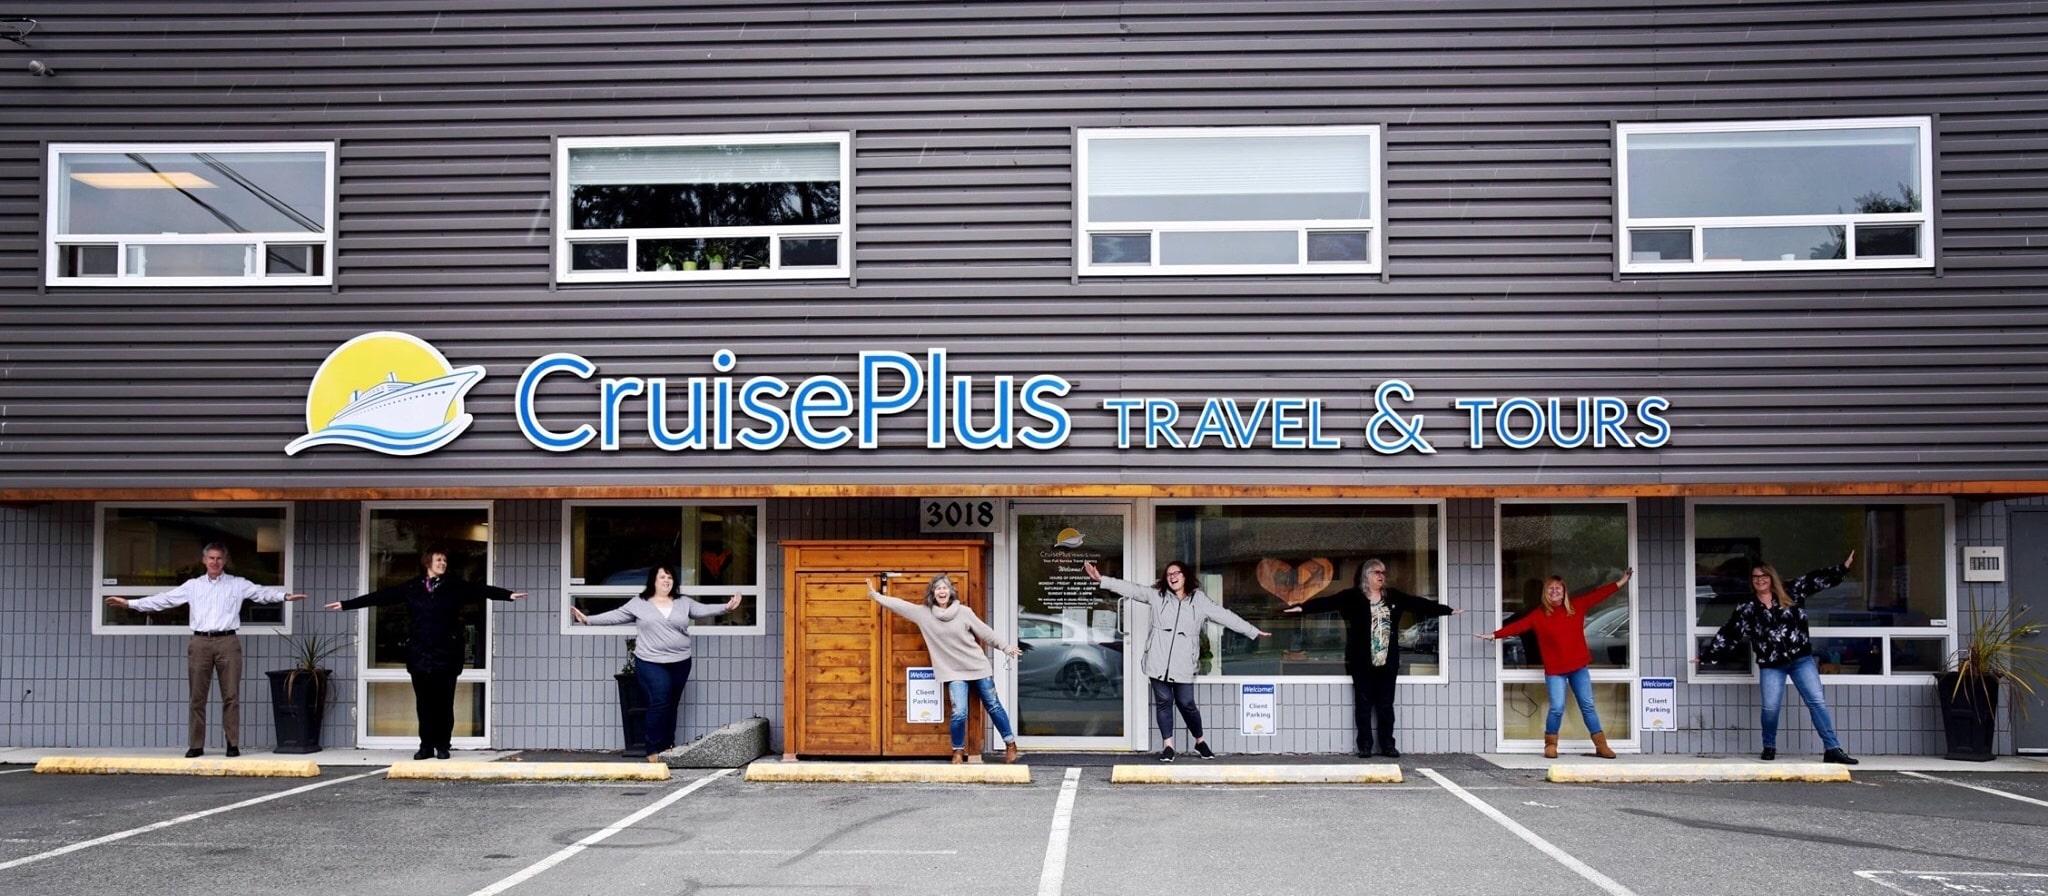 About CruisePlus Travel & Tours - Staff Photo